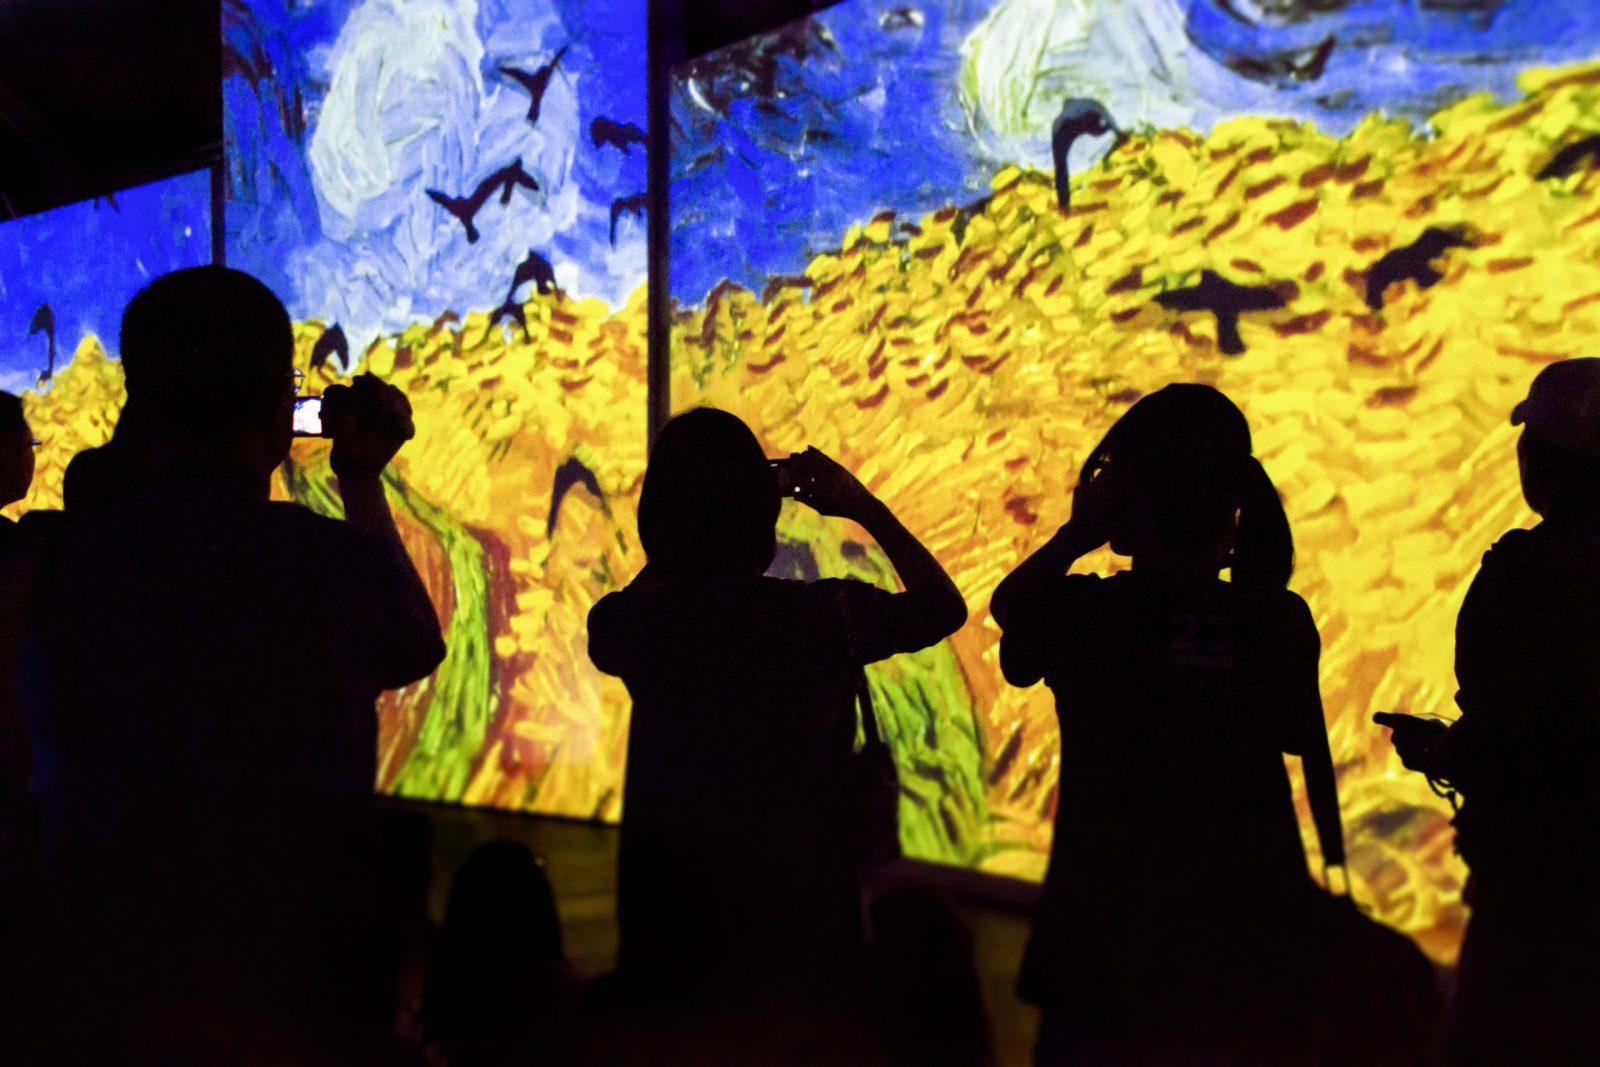 Dali Museum Van Gogh Alive installation rendering Copyright: © 2020 Grande Experiences